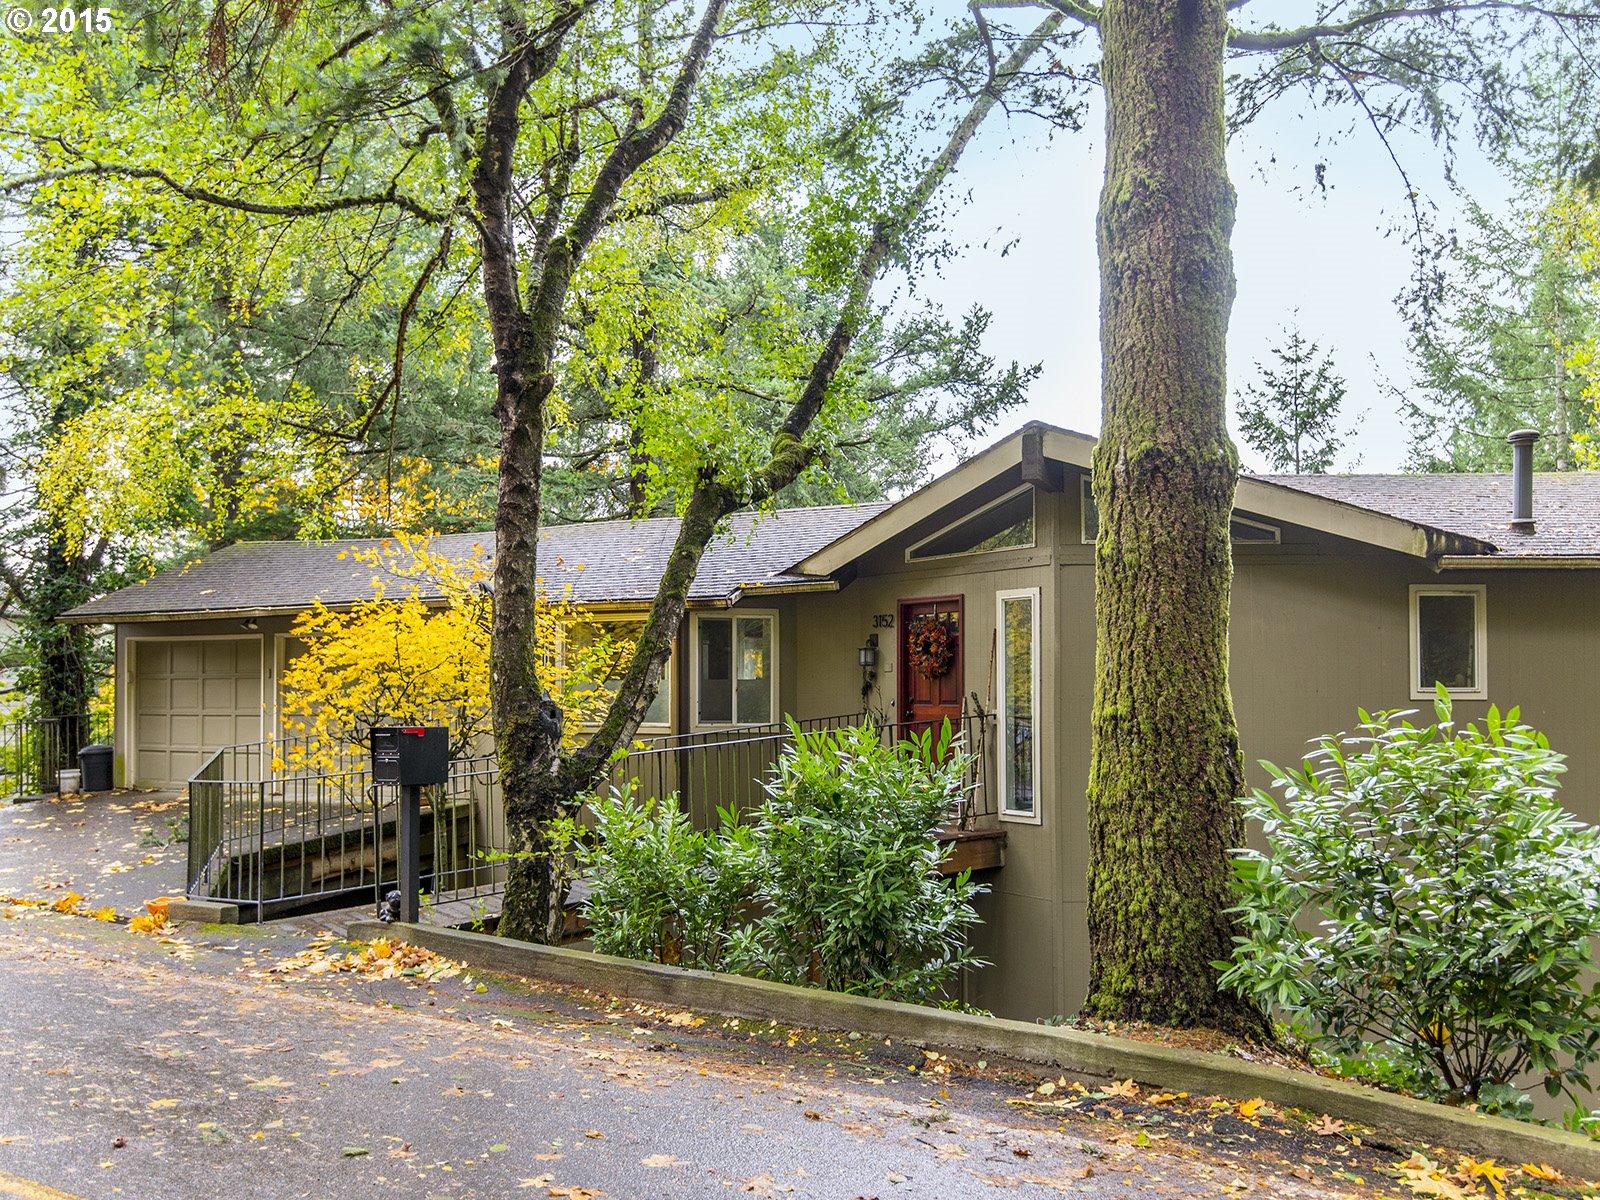 3152 SW FAIRMOUNT BLVD, Portland OR 97239